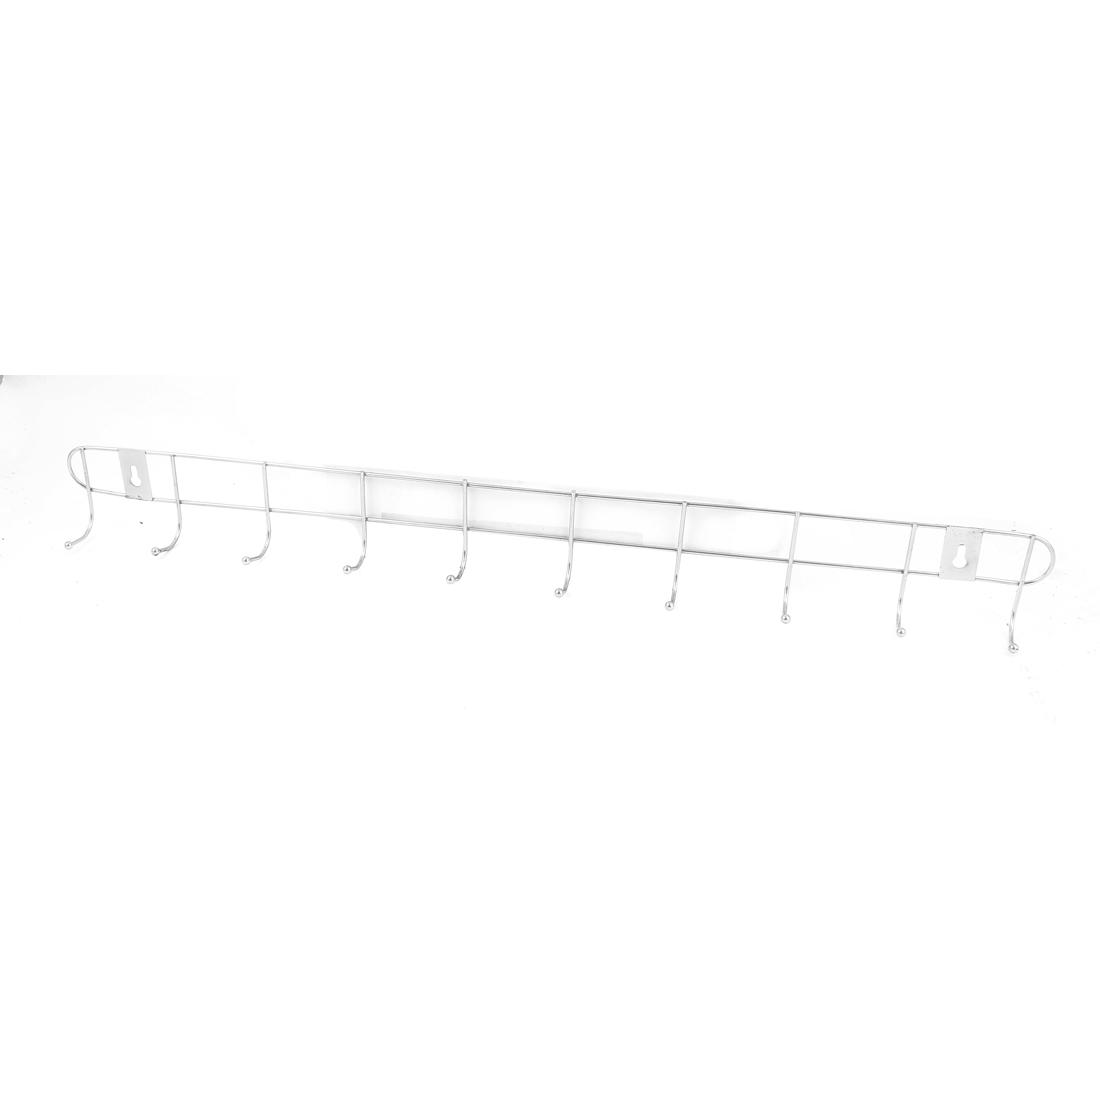 Home Bedroom Bathroom Hat Coat Towel Wall Mounted Metal 10 Hooks Hanger Rack Holder